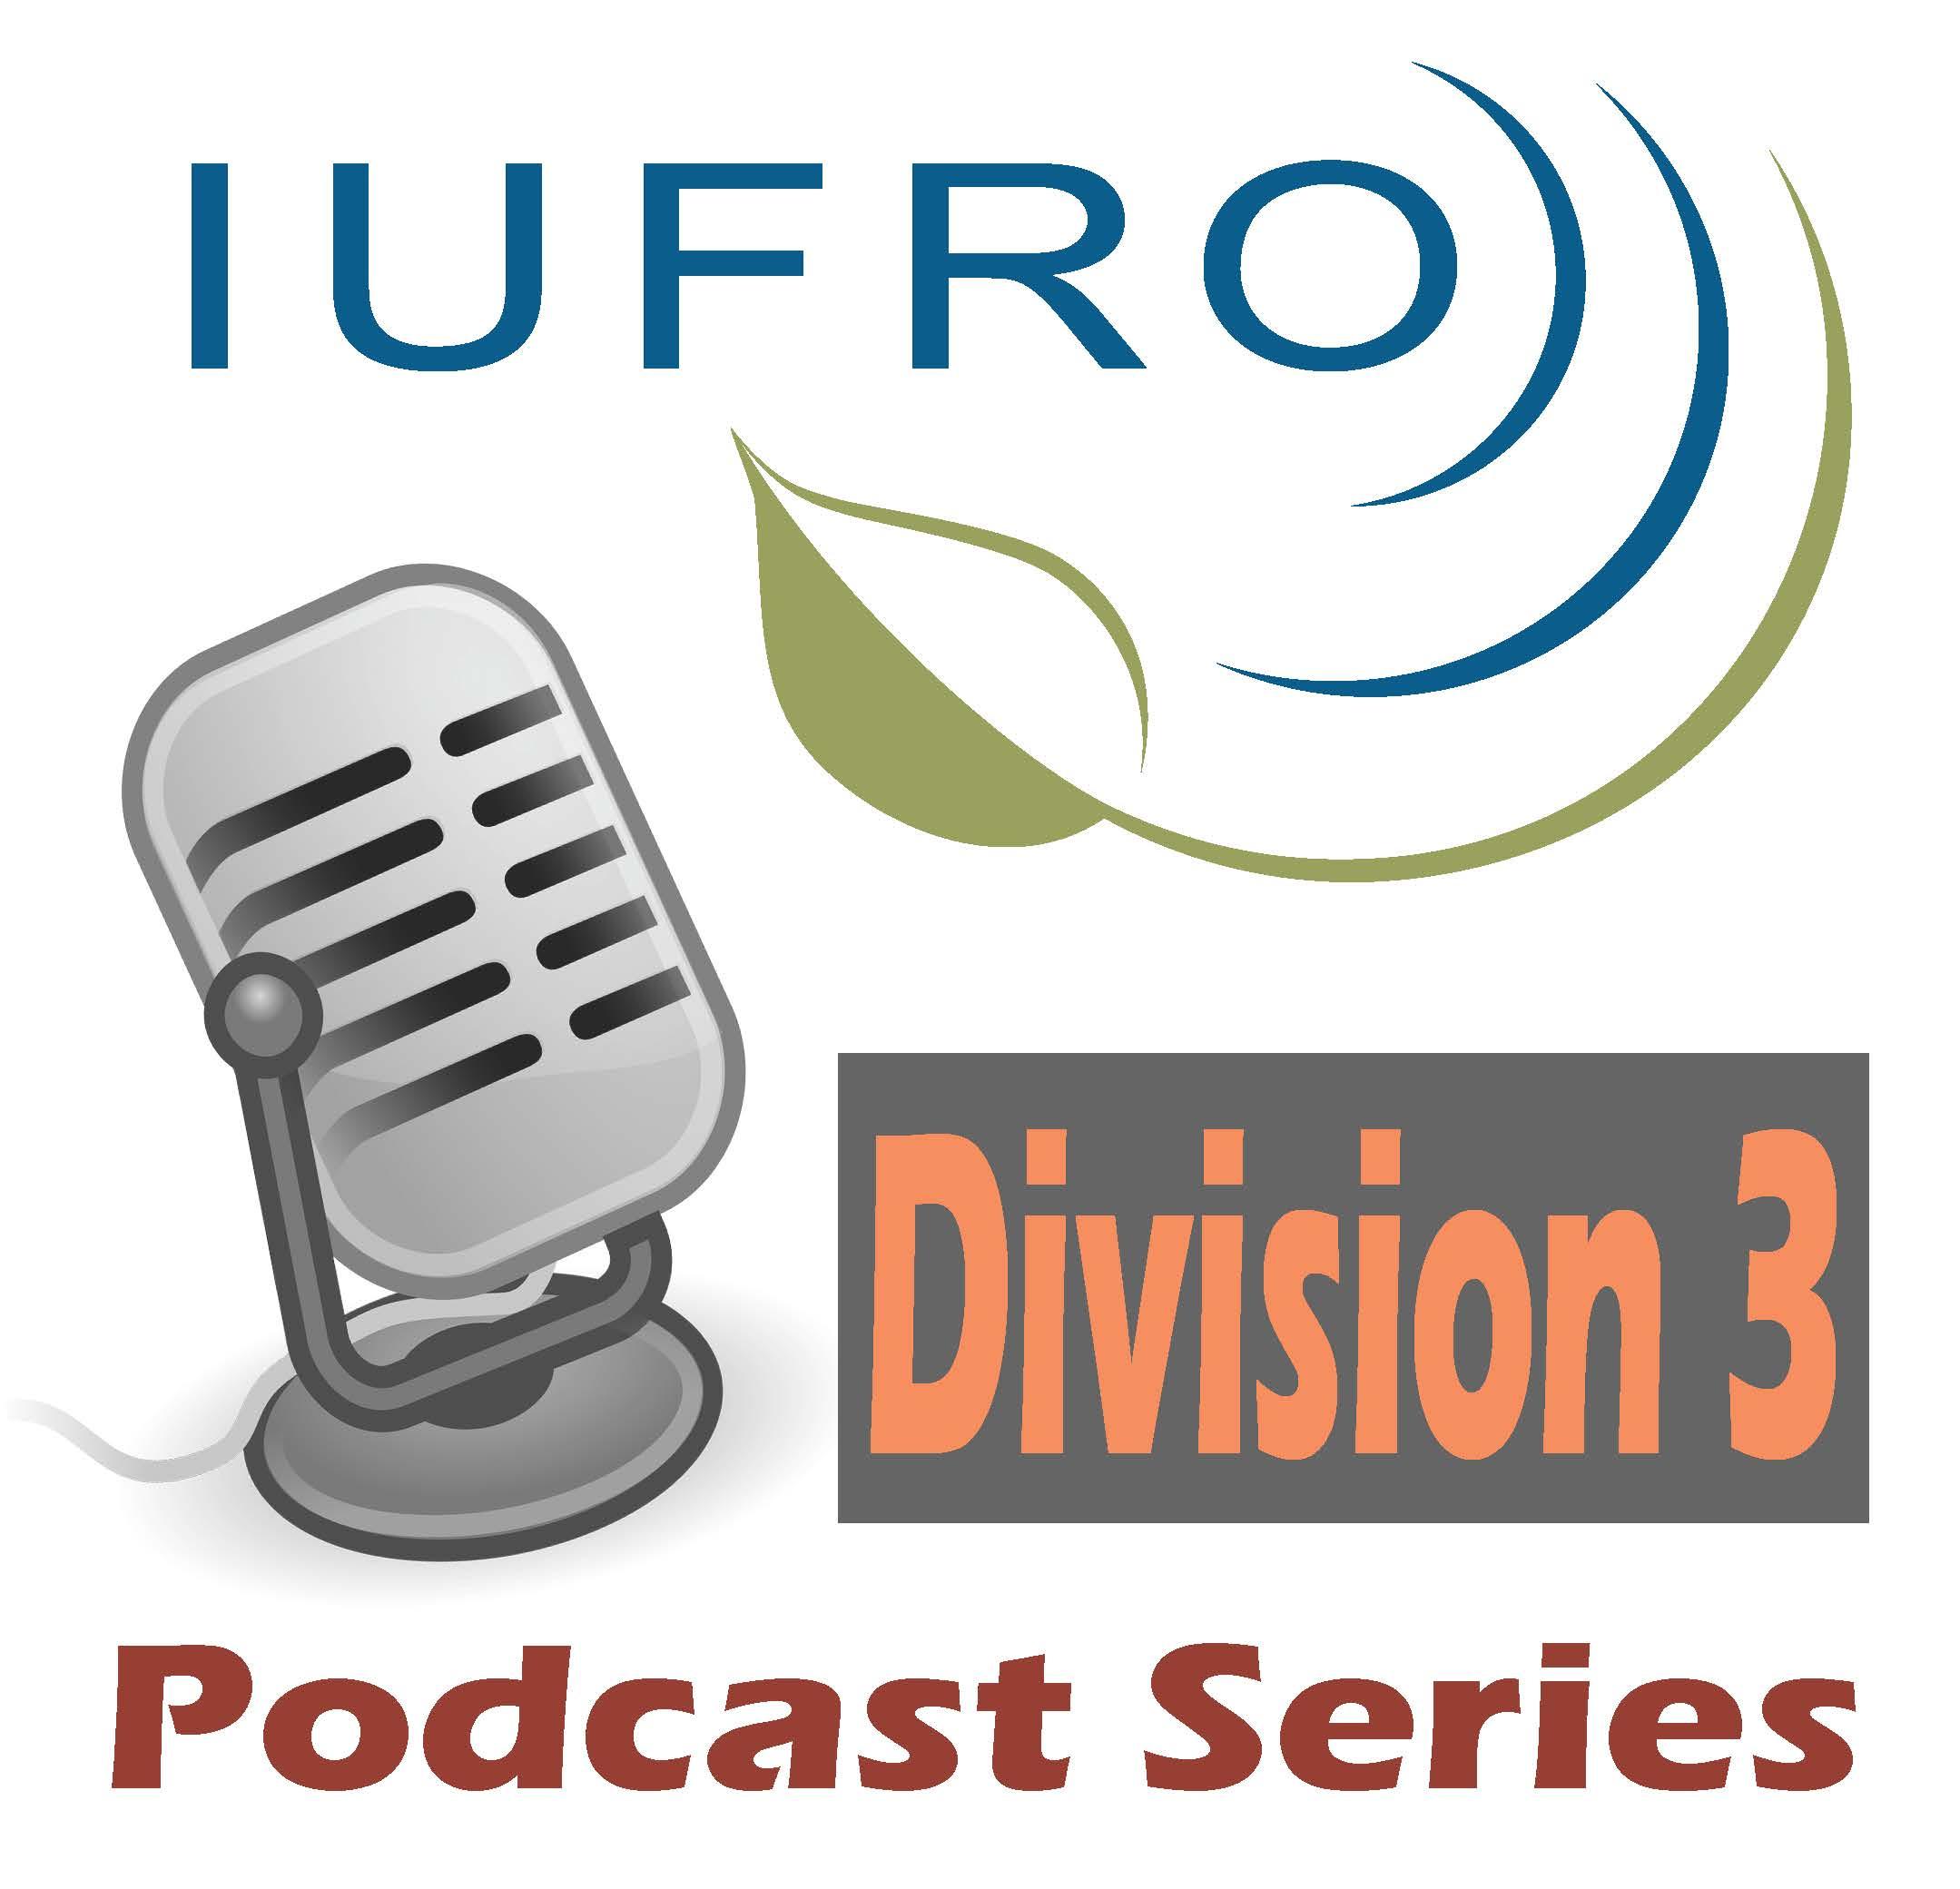 IUFRO Division 3 Podcast